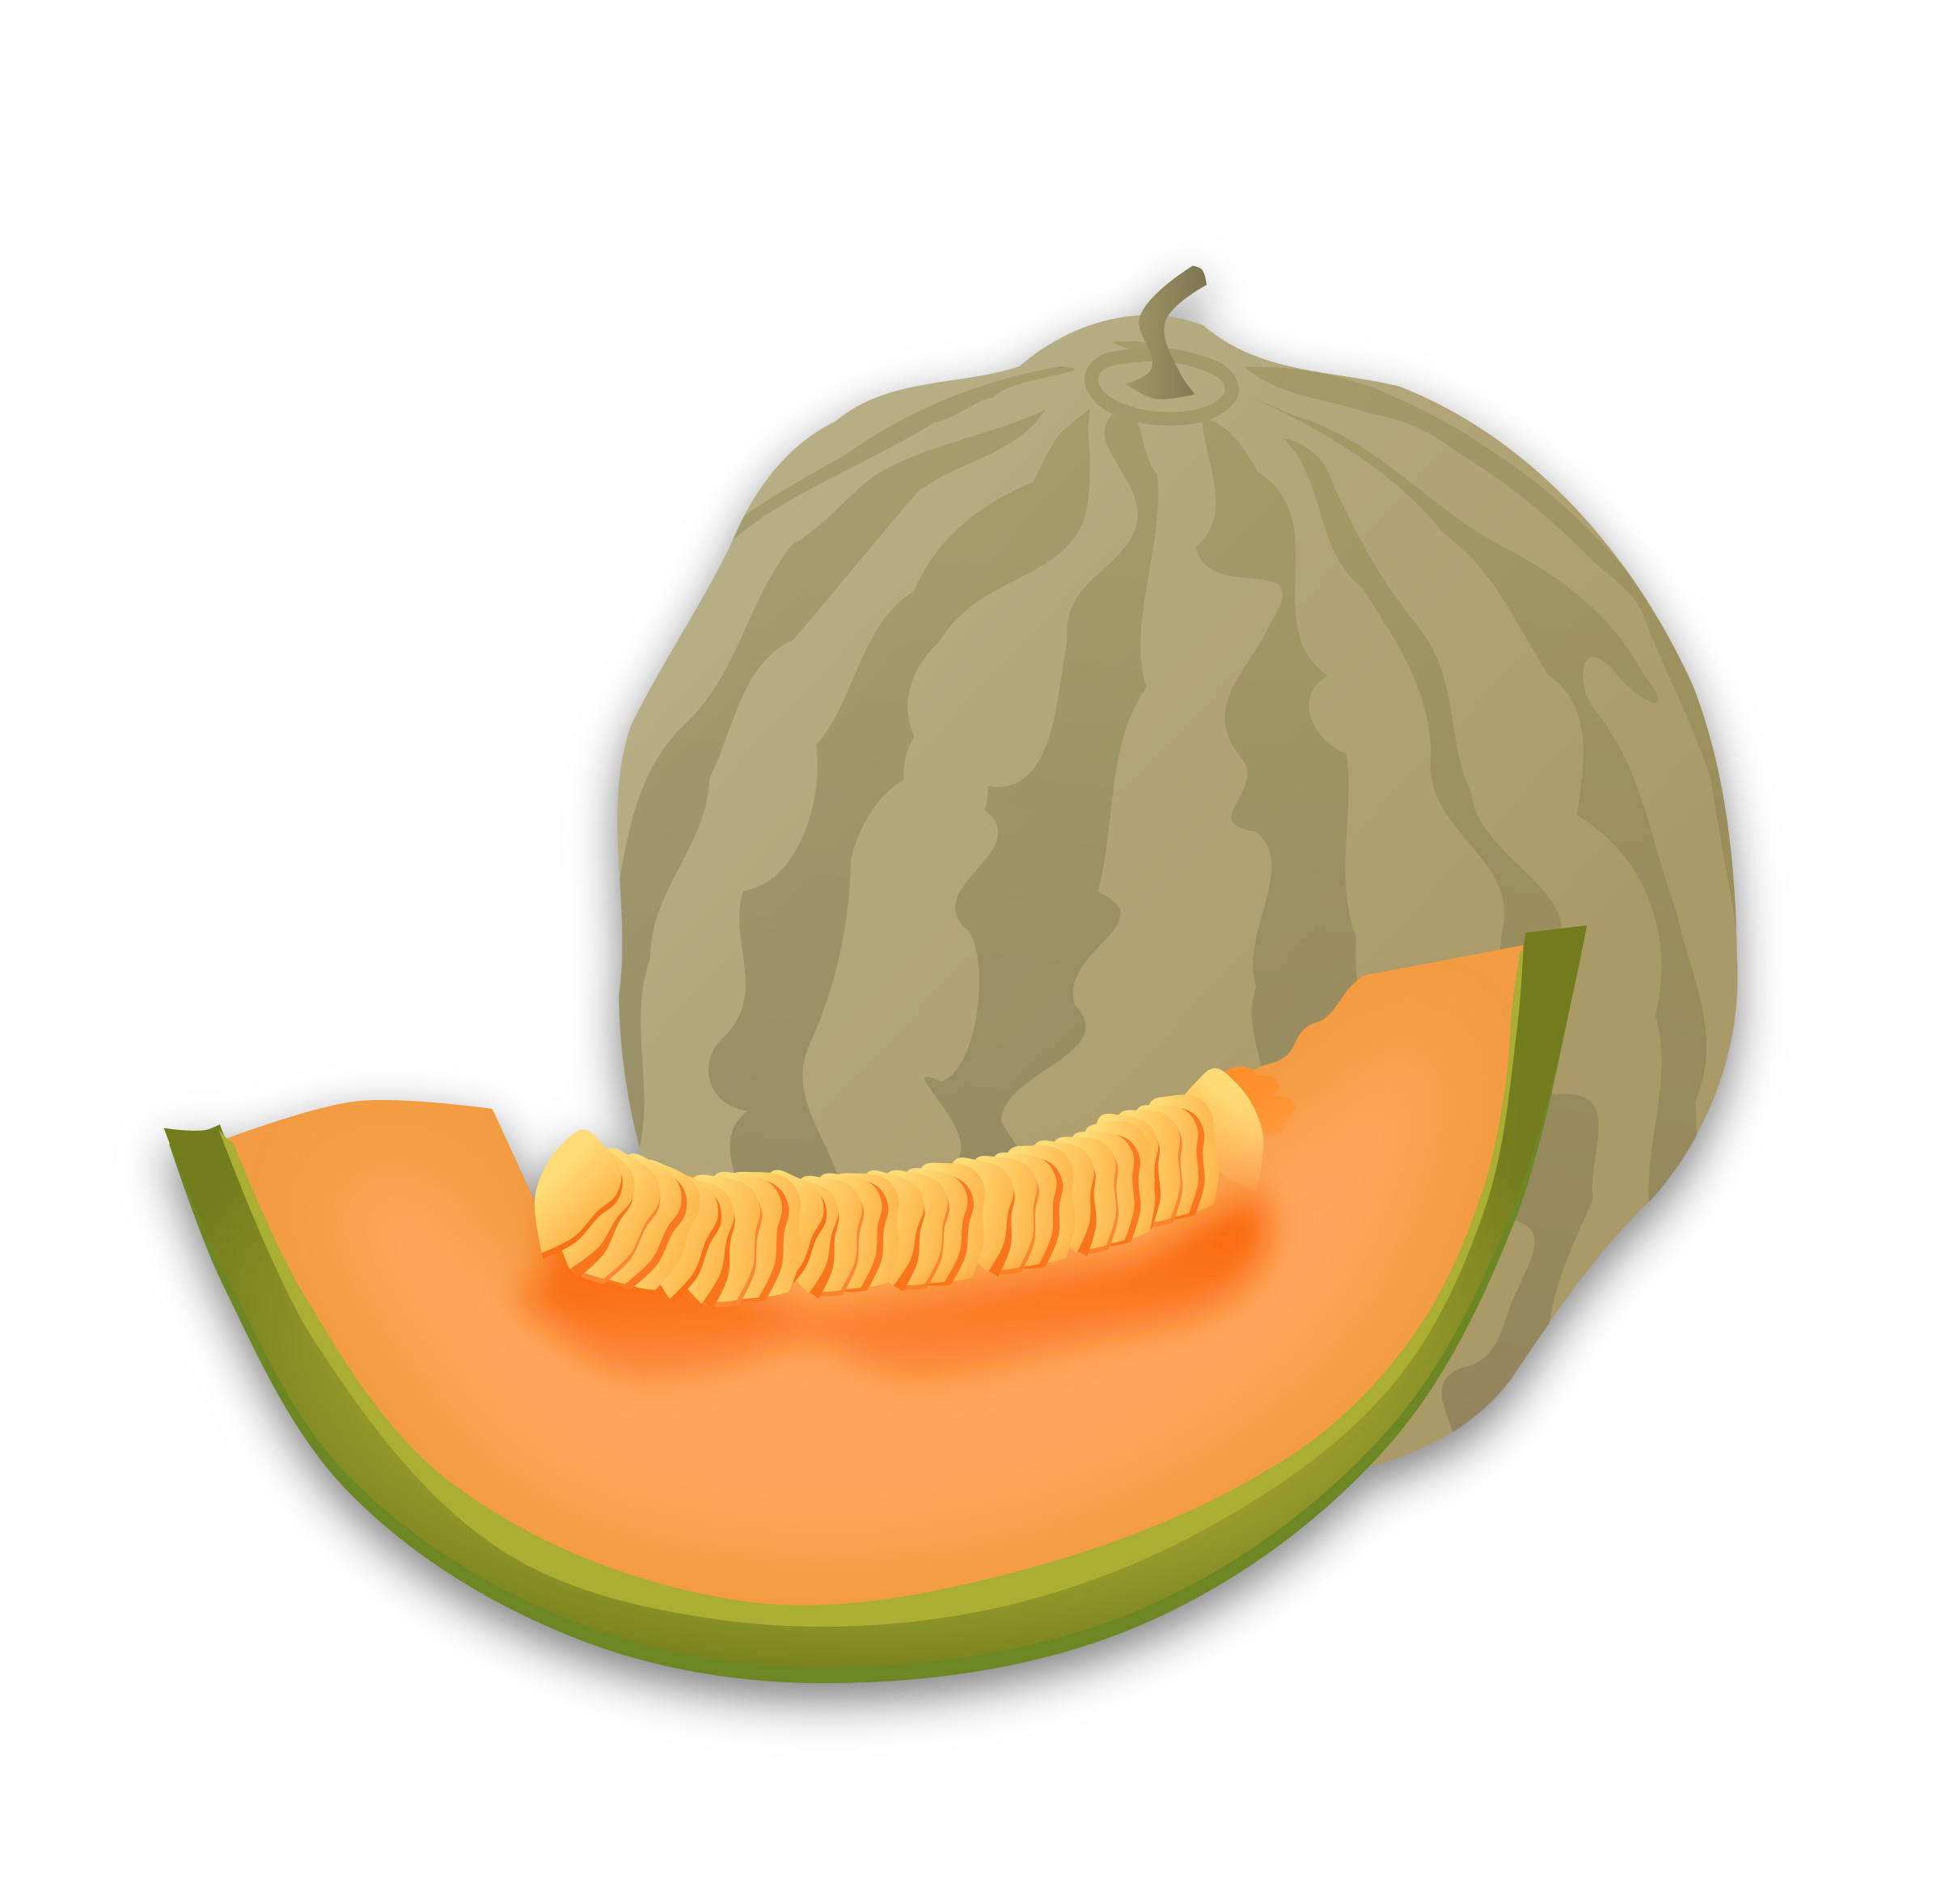 Musk melon big image. Watermelon clipart muskmelon